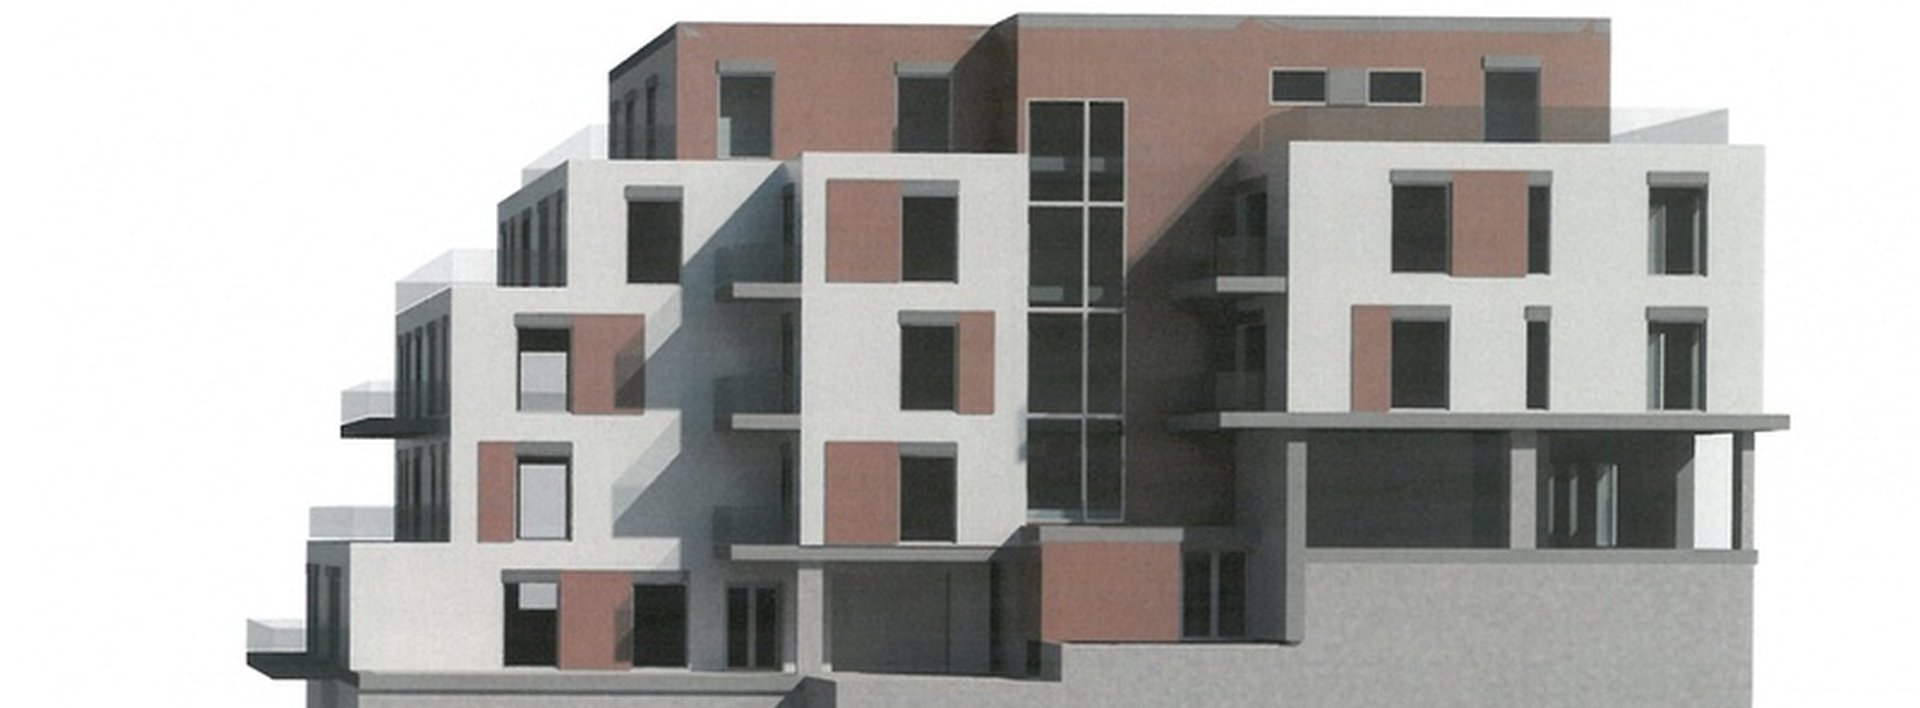 Byt 4+kk v novostavbě - Apartmánový dům Pavlovická, Ev.č.: N47954